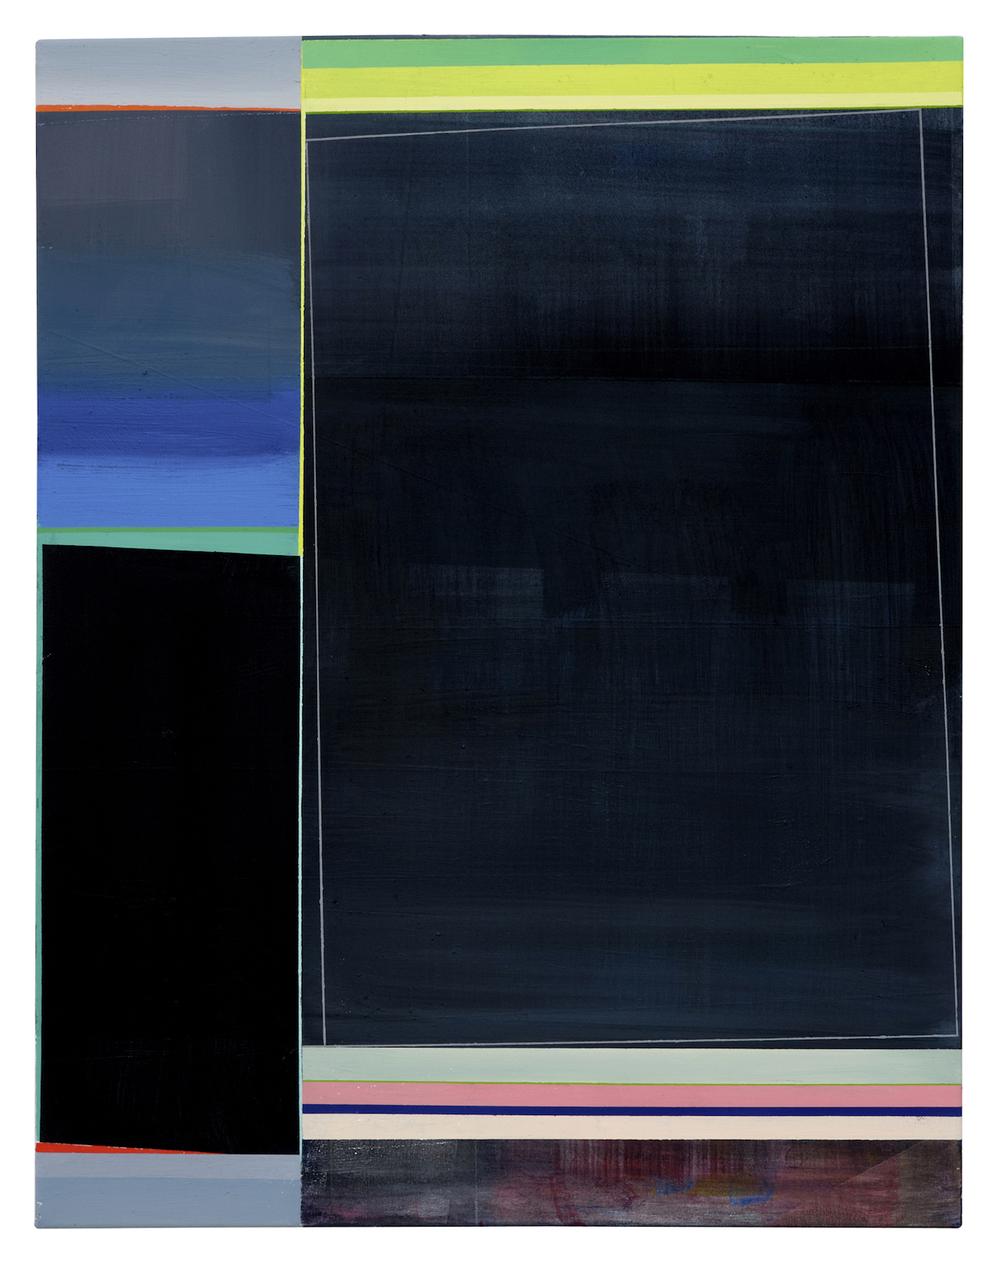 o.T . · 90 x 70 cm · Acryl, Pigment auf Leinwand, 2010